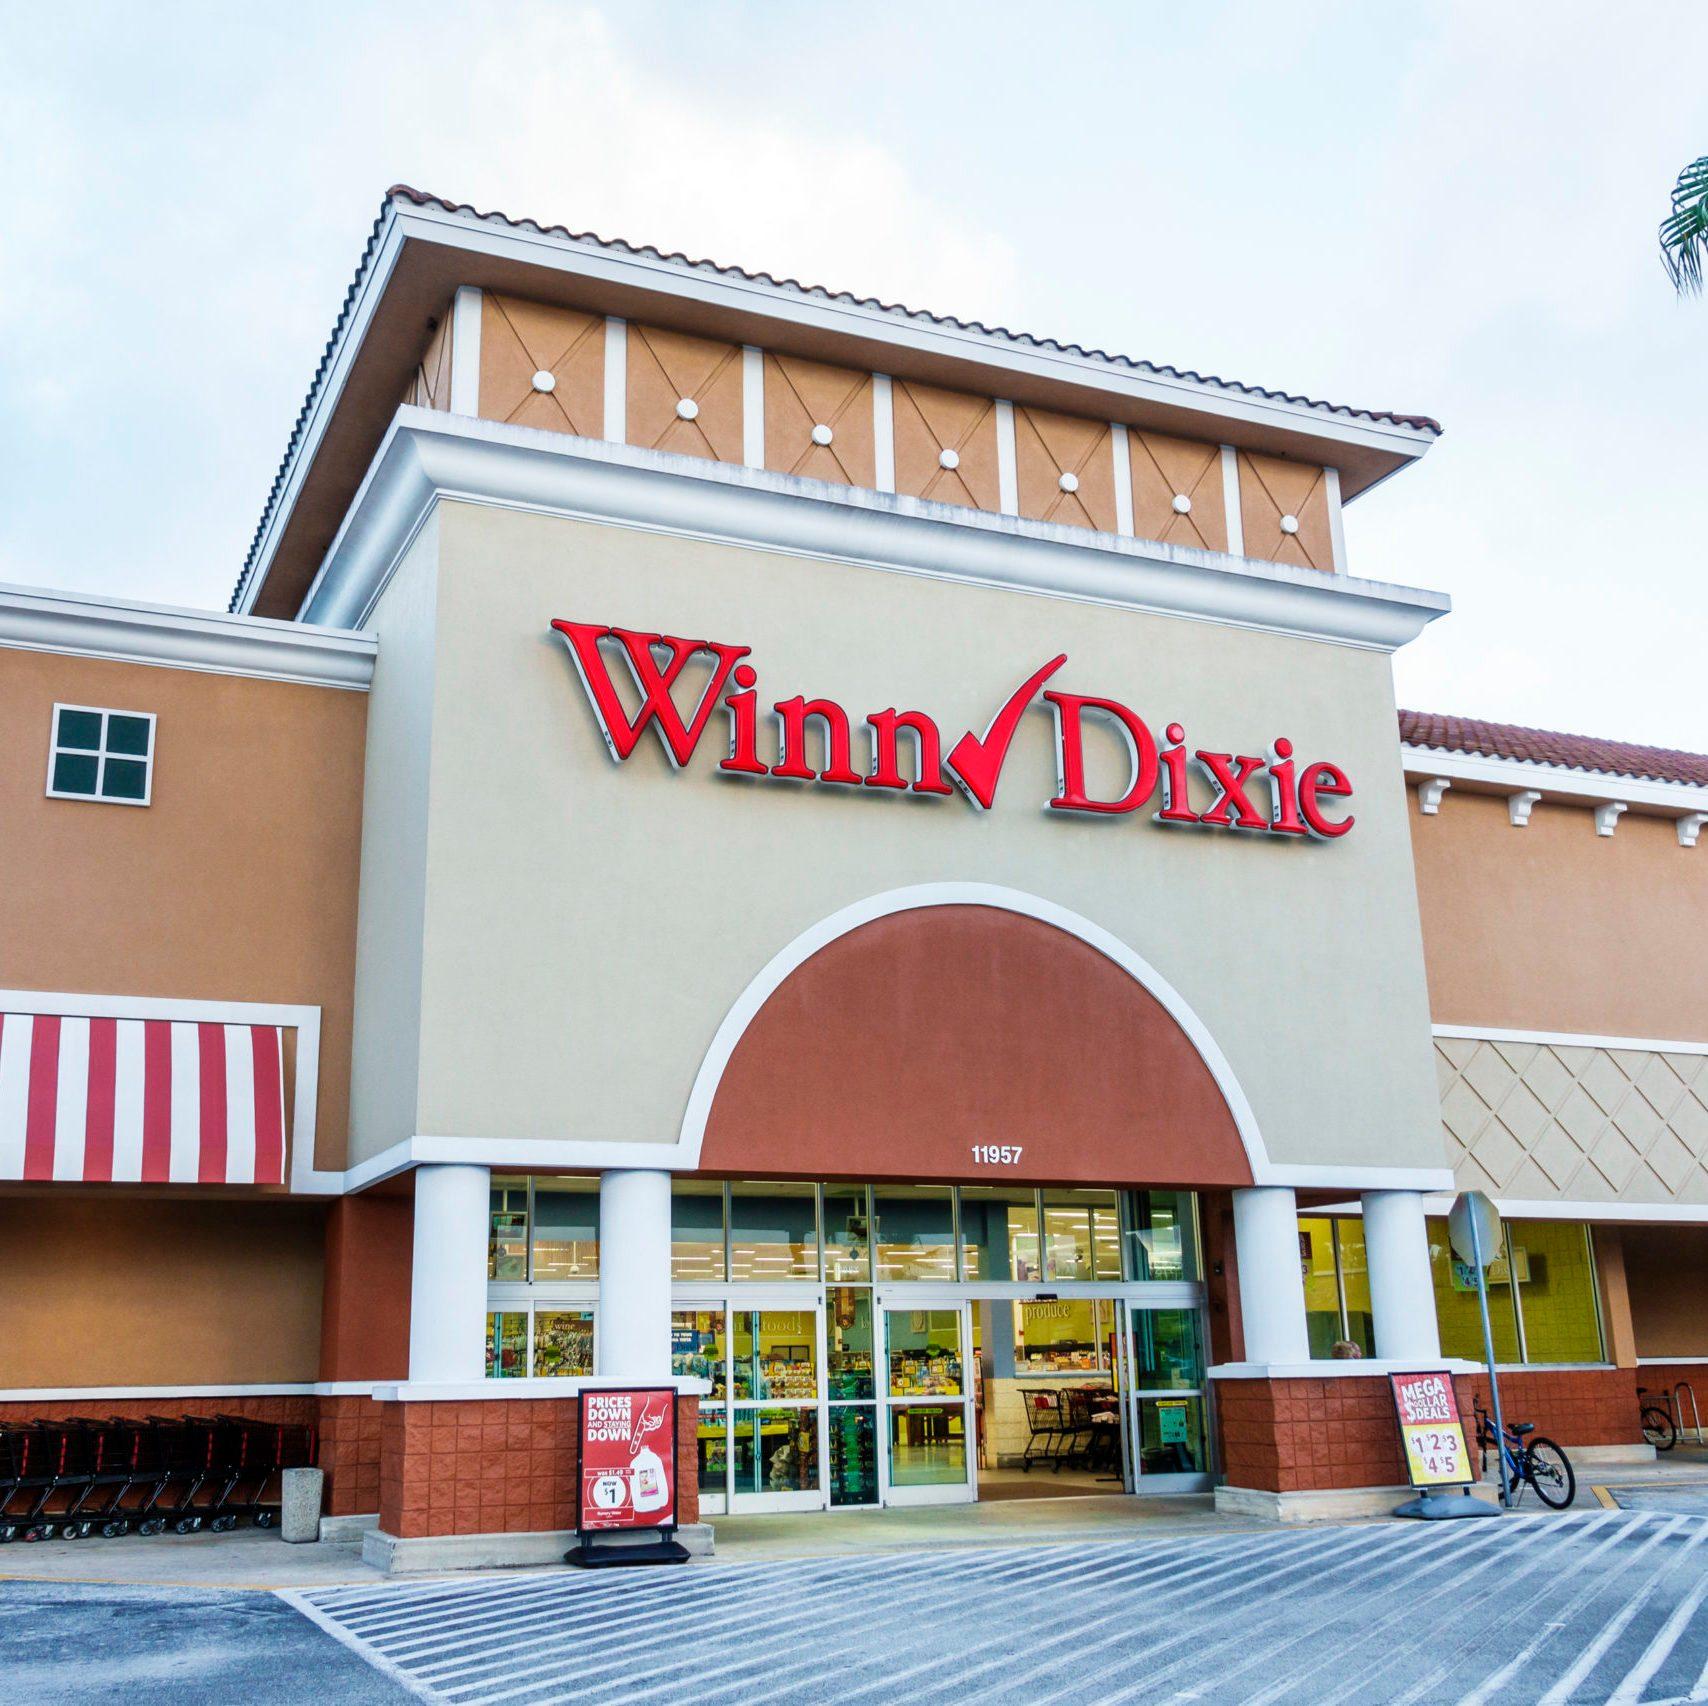 Orlando, Lake Buena Vista, Winn Dixie Supermarket Exterior